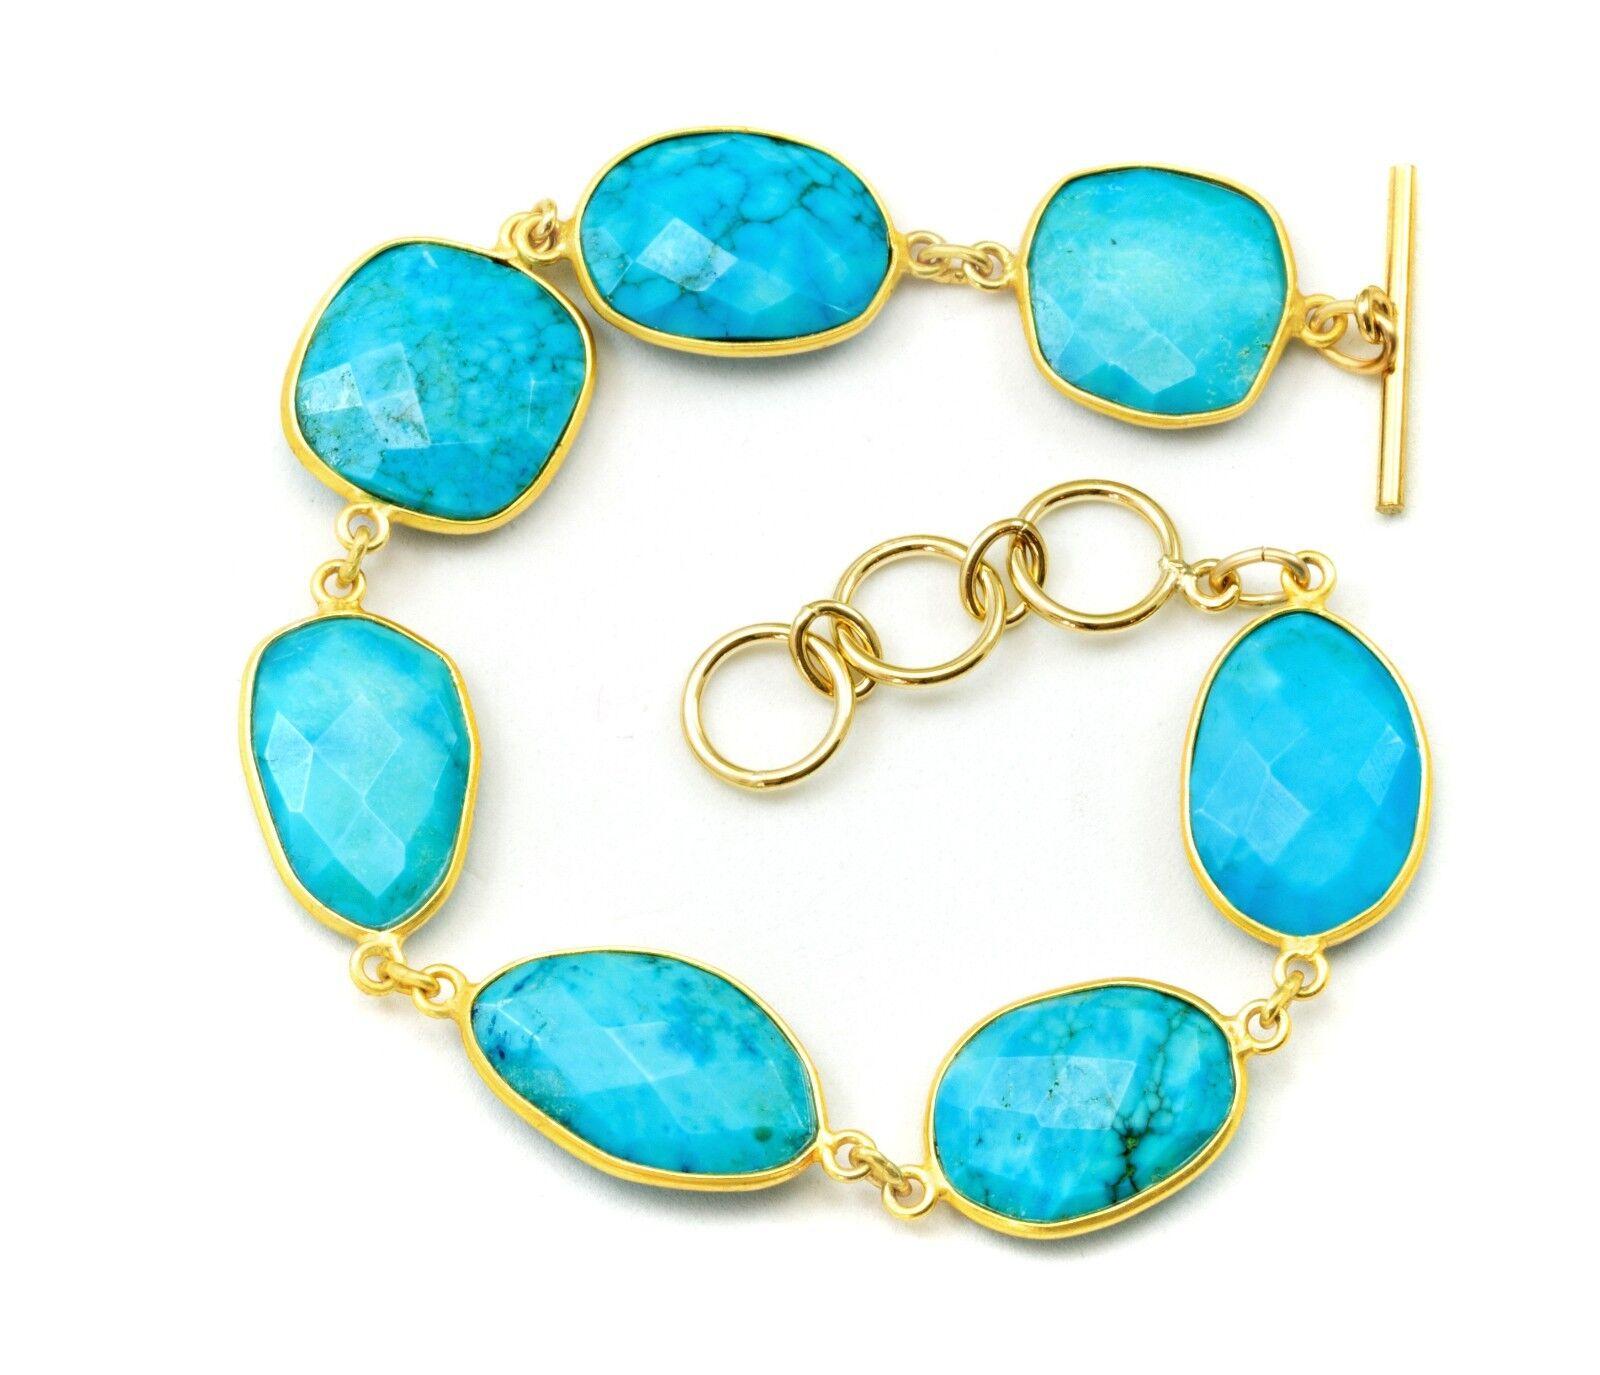 bluee Turquoise Bracelet Large Bezel Set Faceted 8 Inch Adjustable 9 Inches